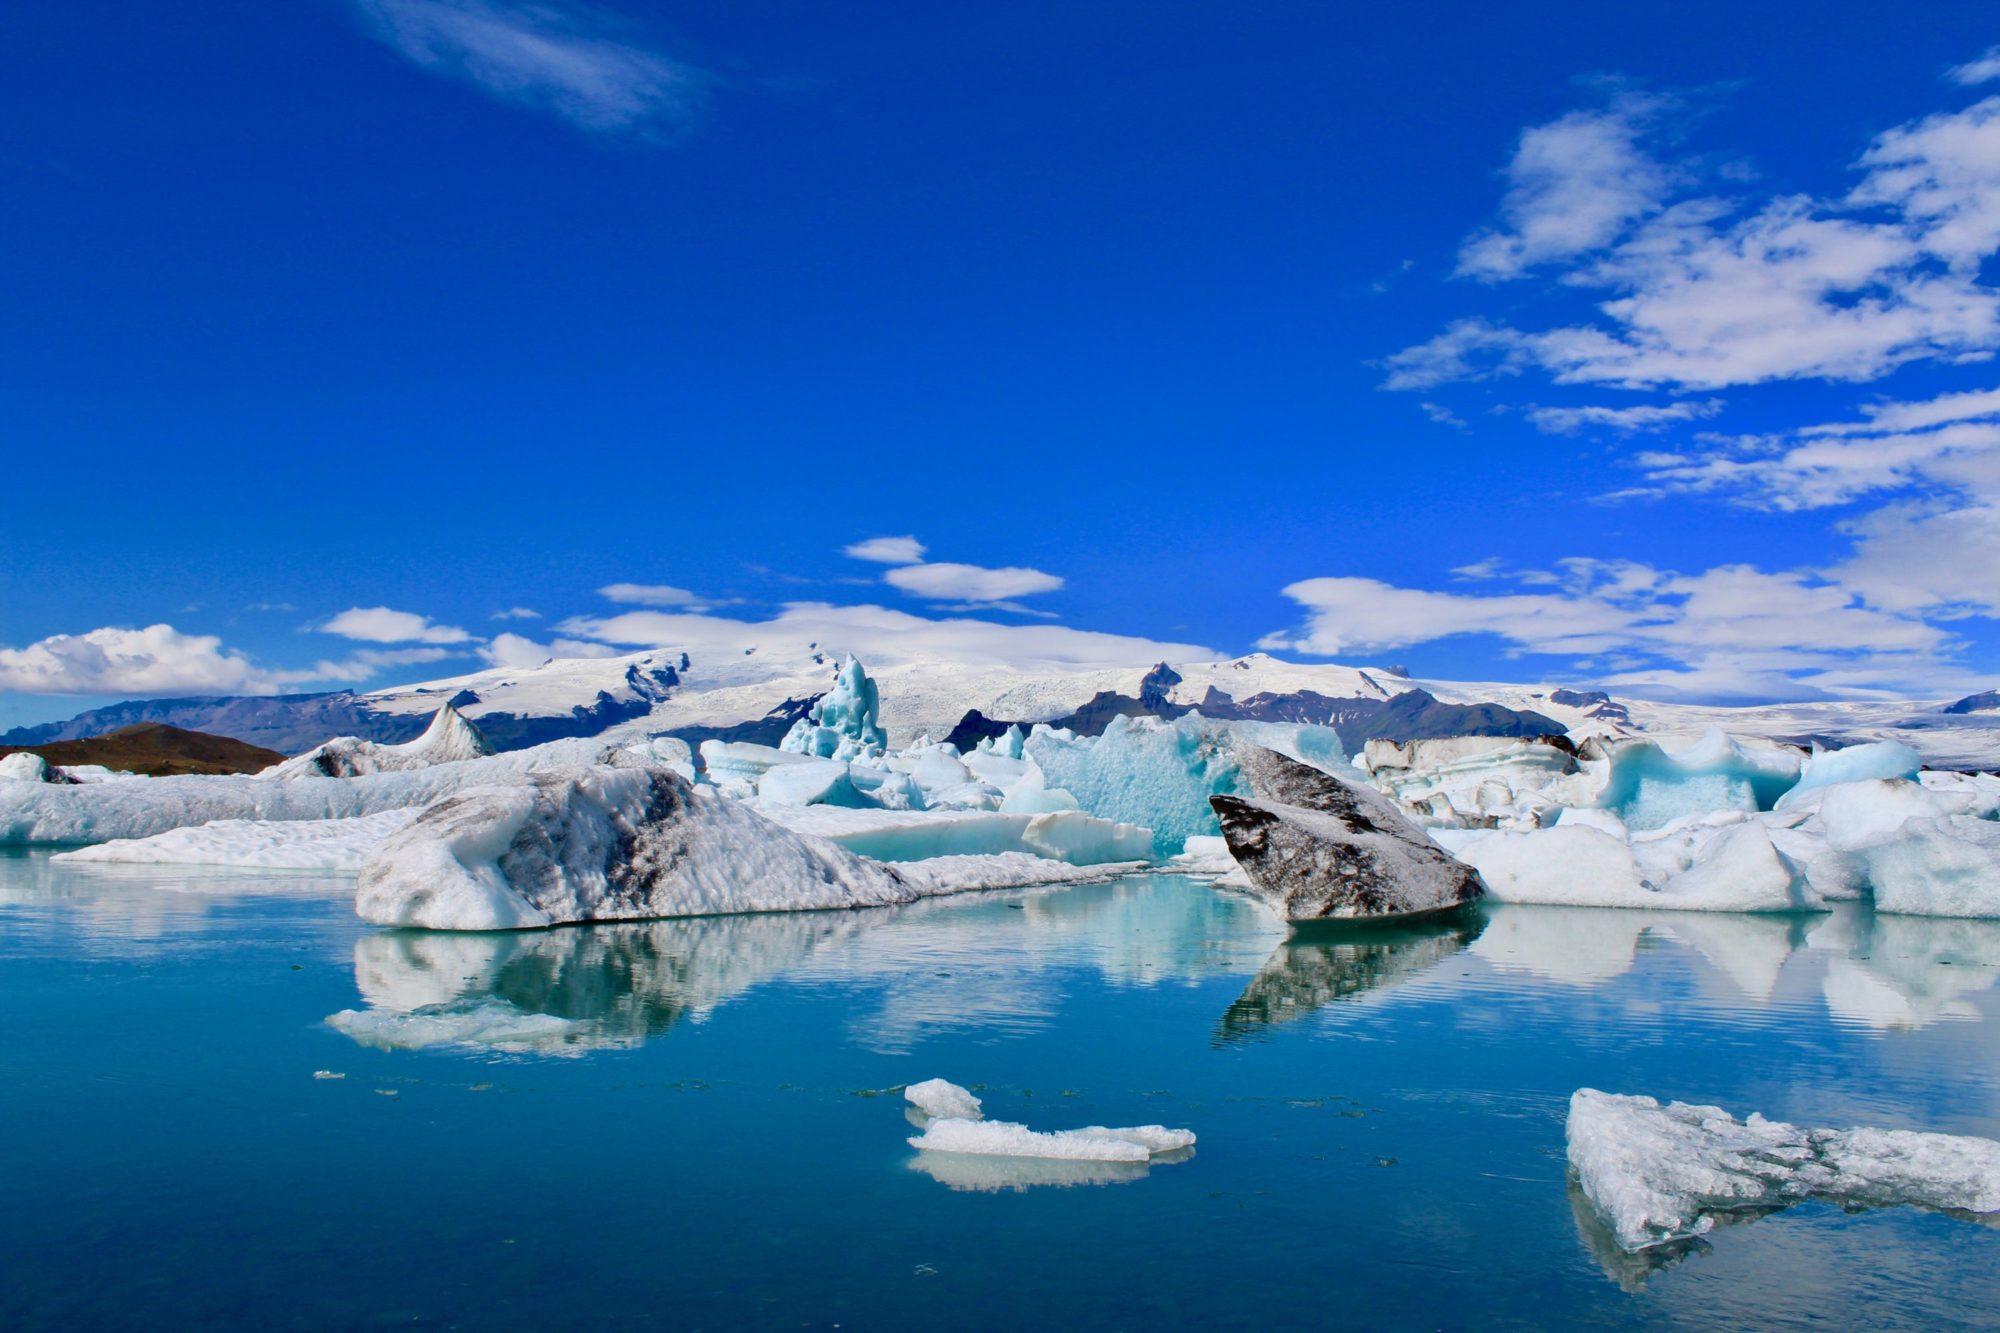 IMG 1307 e1535708250634 ICELAND ROAD TRIP